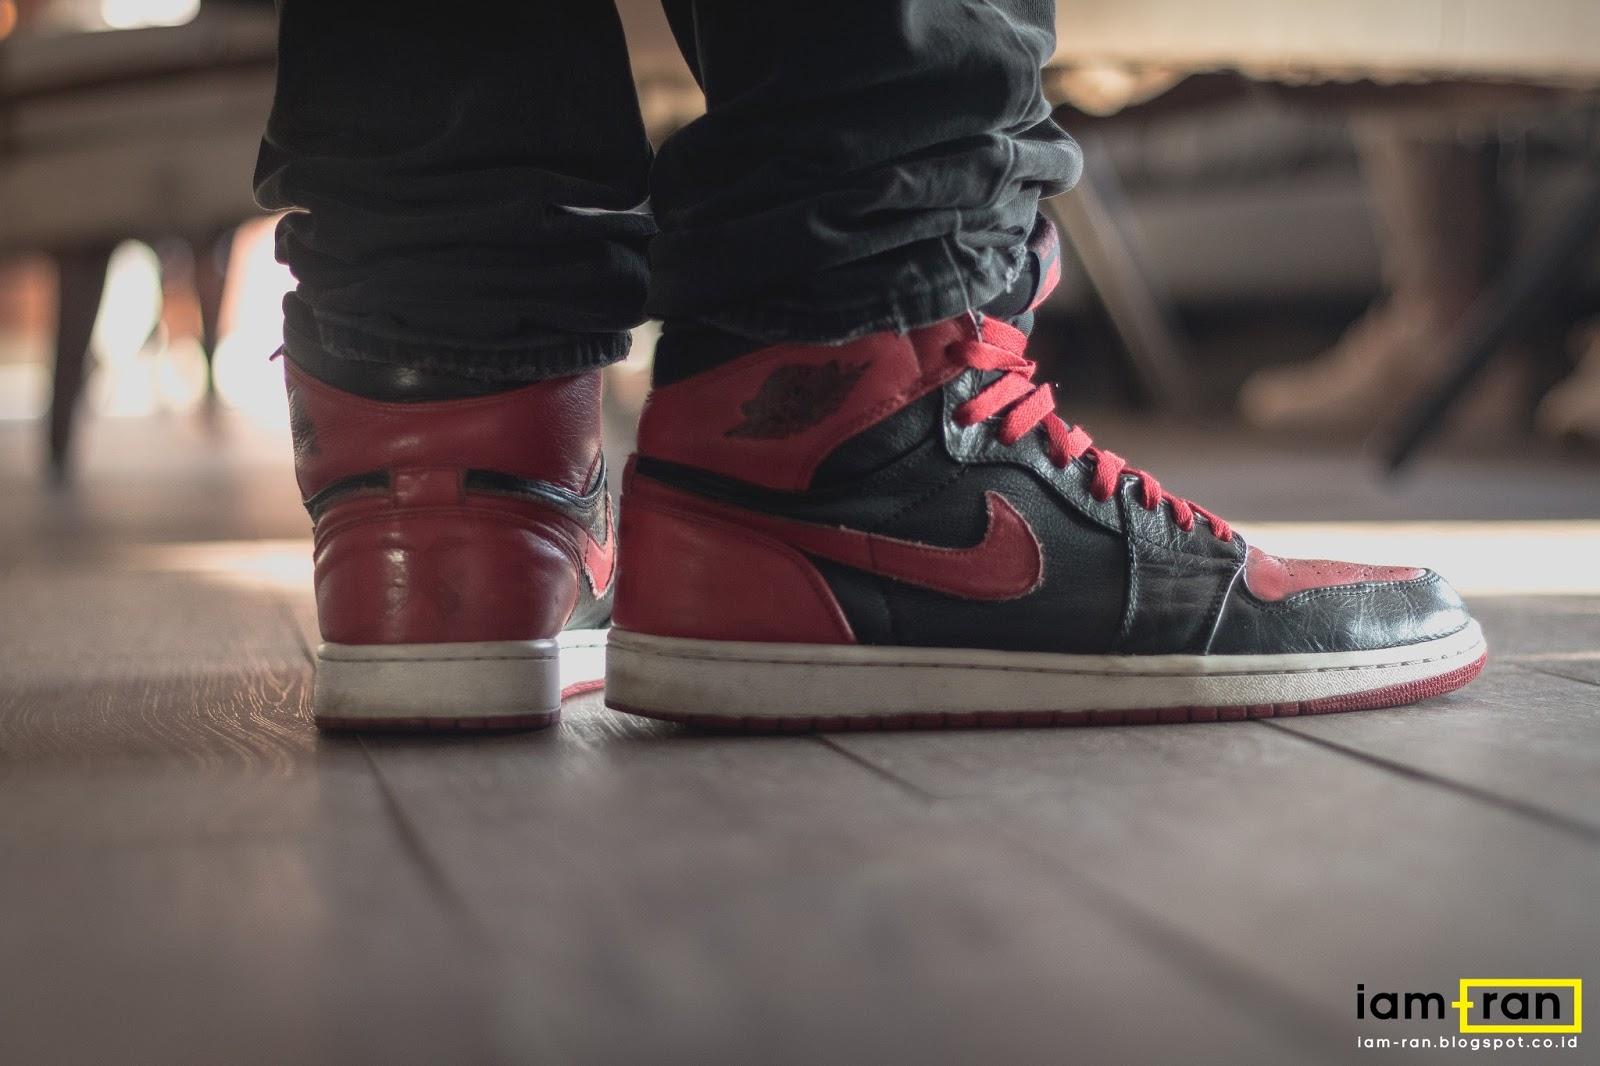 3b5de5b6af9 IAM-RAN: ON FEET : In.Dhika - Nike Air Jordan 1 Bred